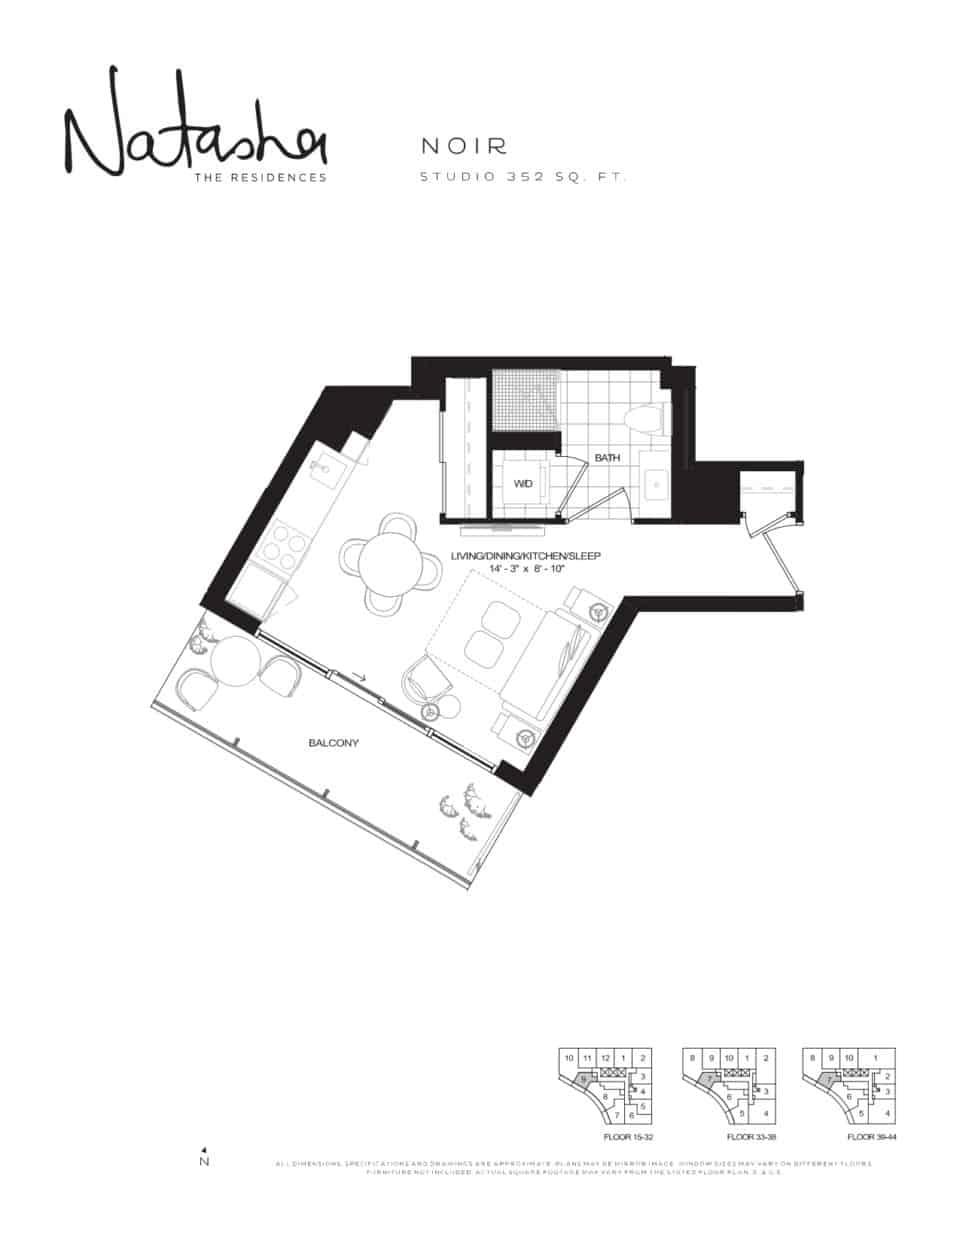 2021 09 02 11 02 42 natashatheresidences lanterradevelopments floorplans noir